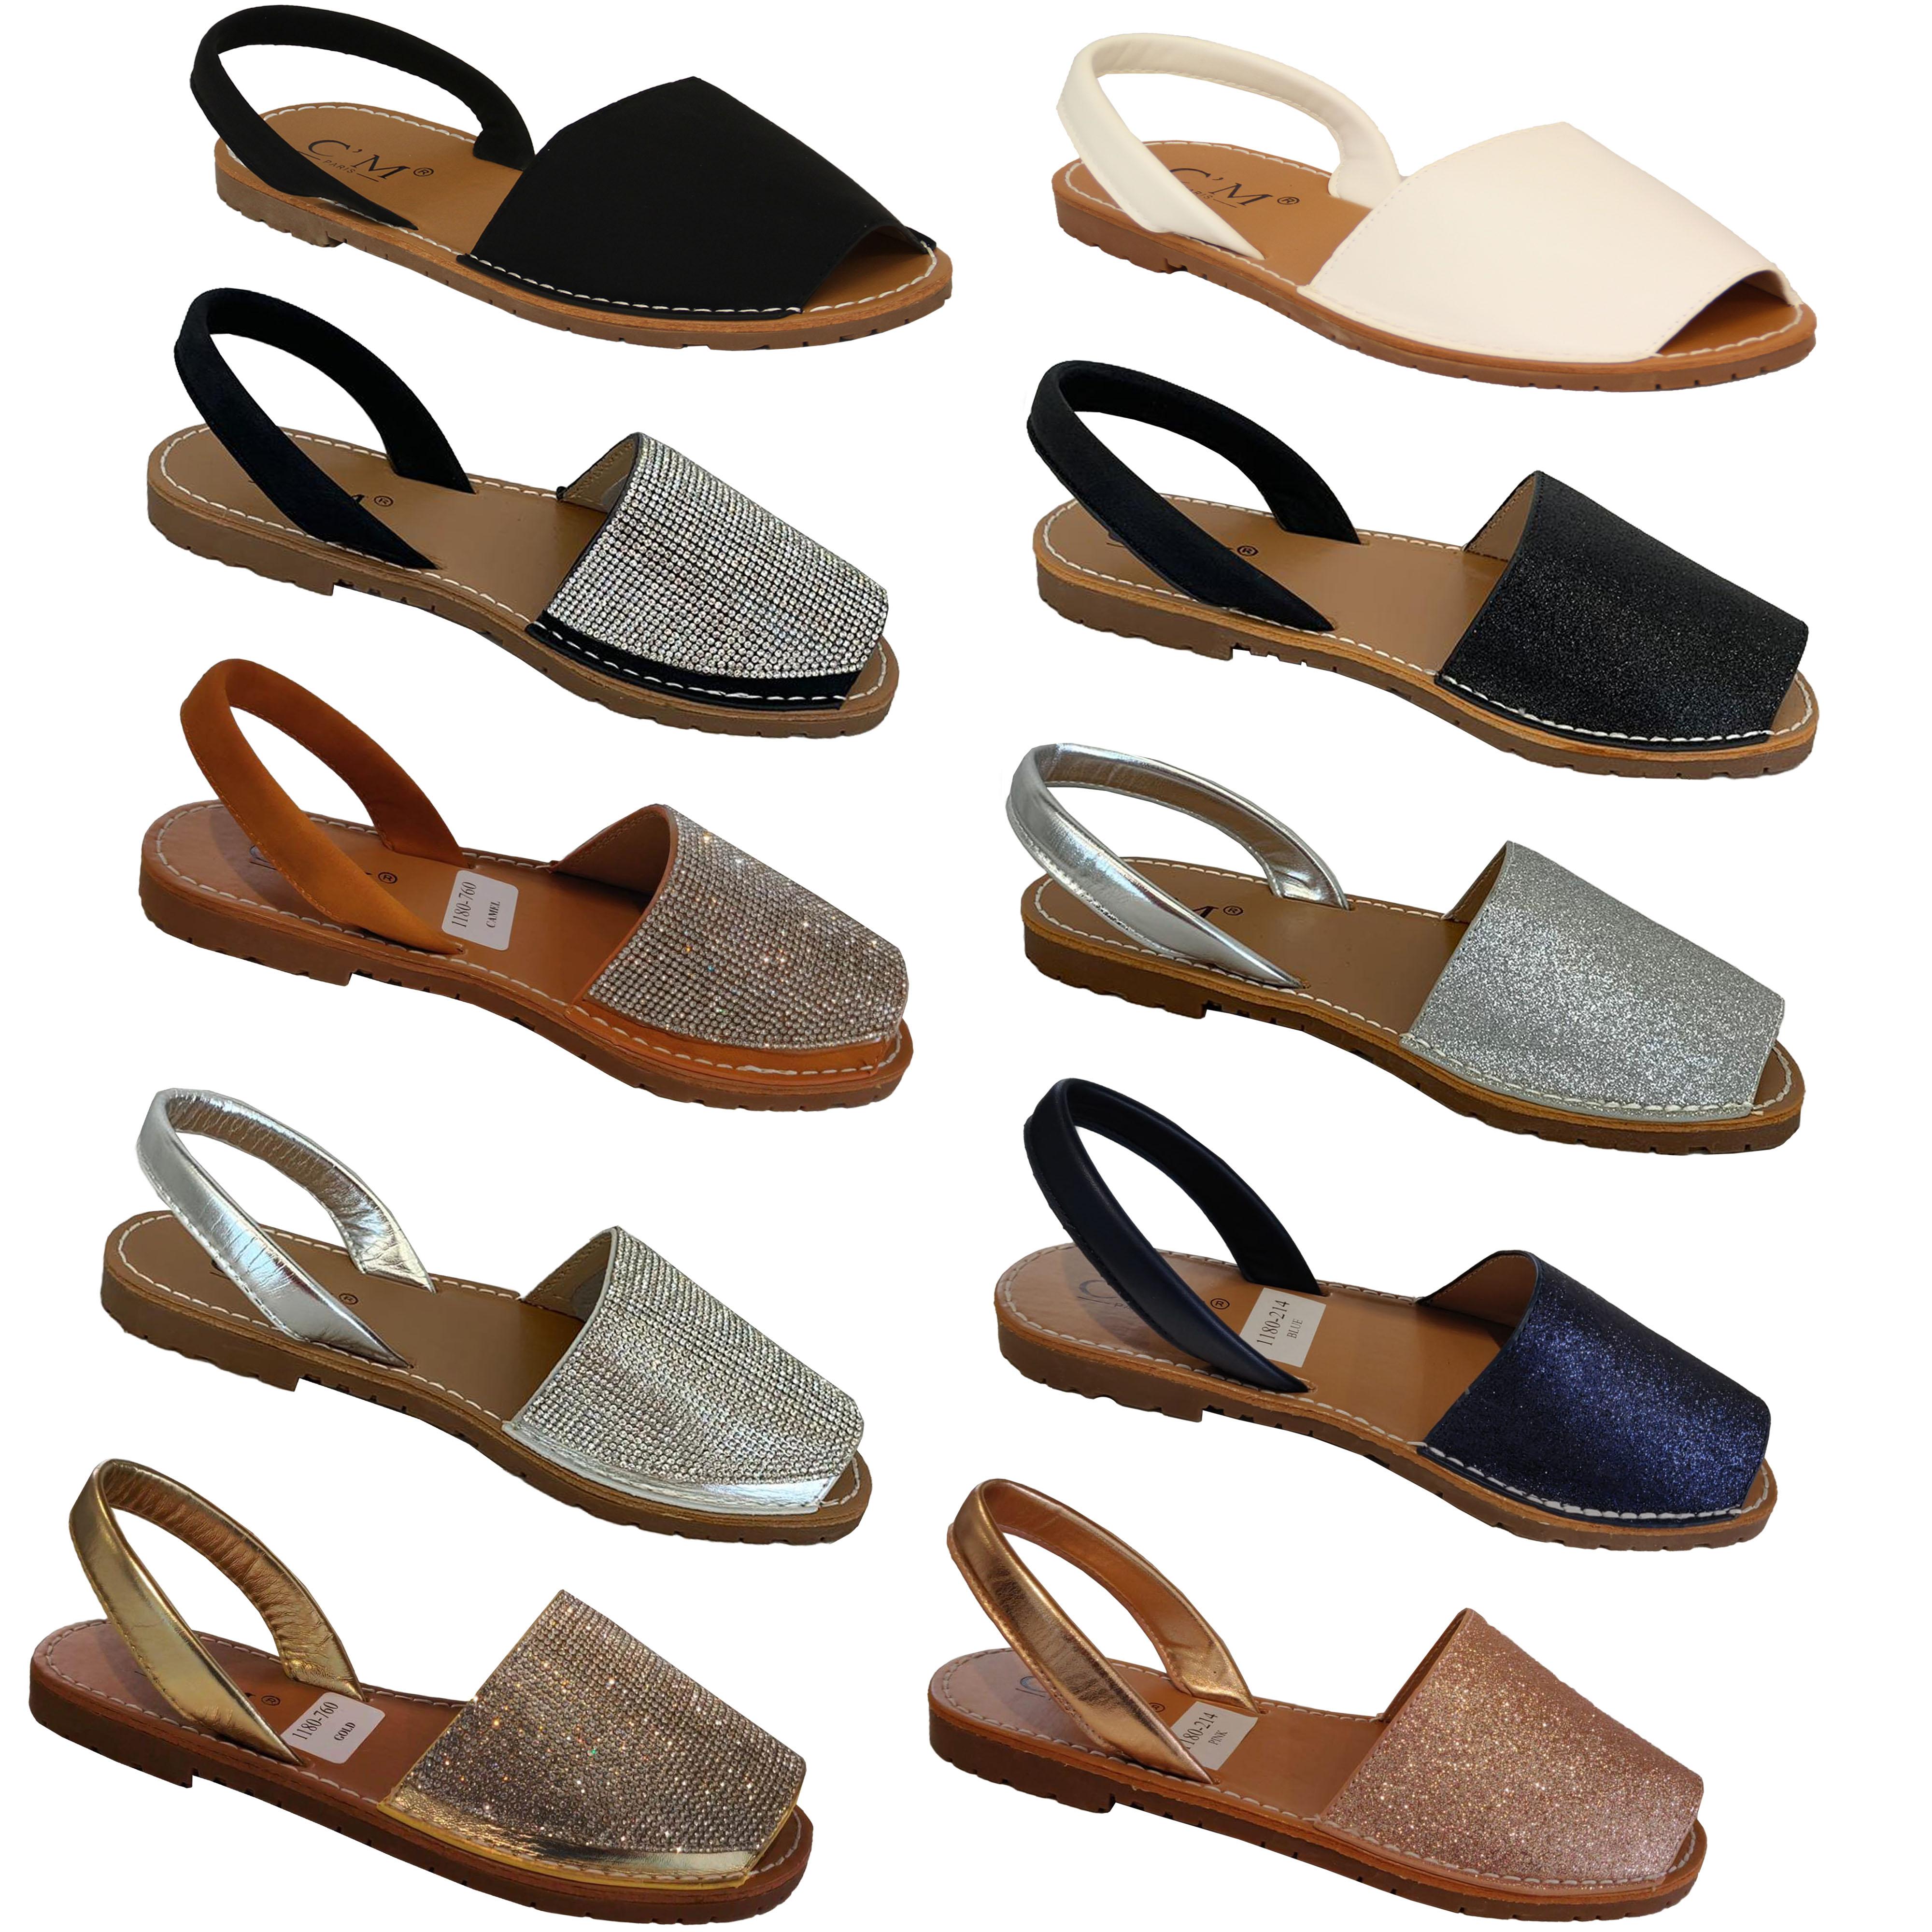 Ladies Sandals Menorcan Womens Slip On